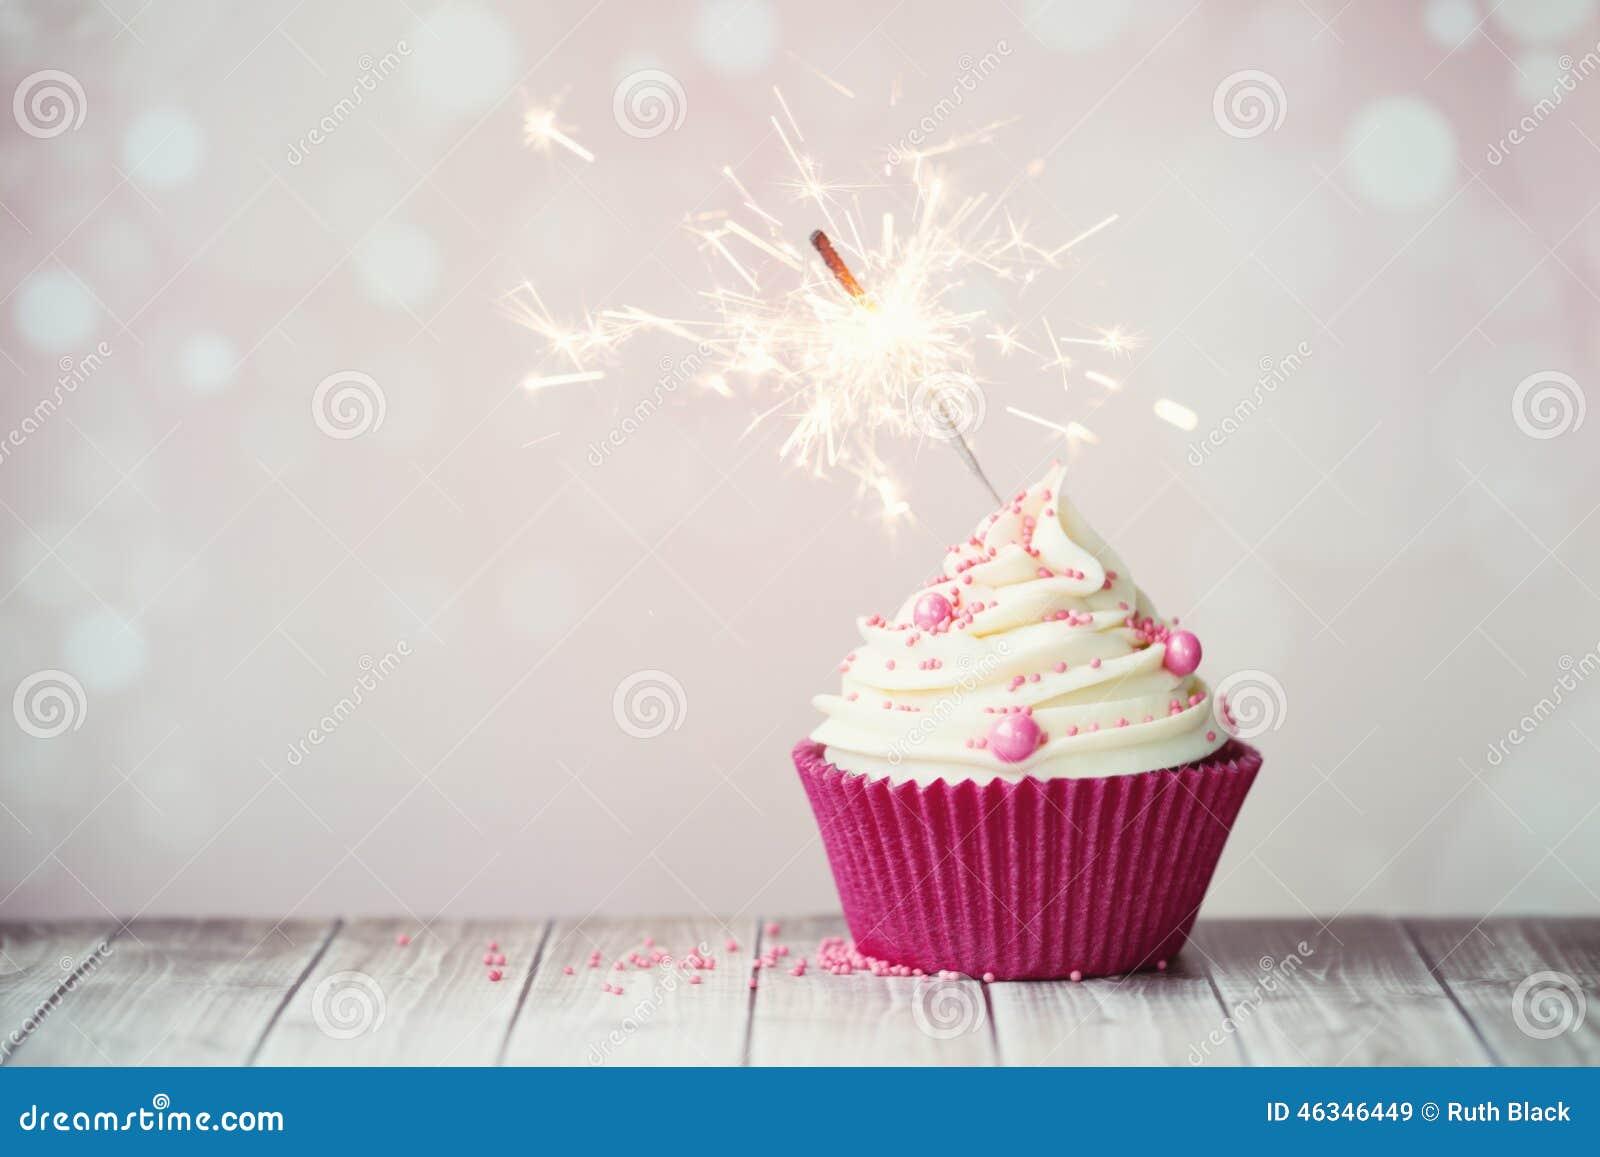 pink cupcake sparkler birthday 46346449 birthday cake candles sparklers 4 on birthday cake candles sparklers